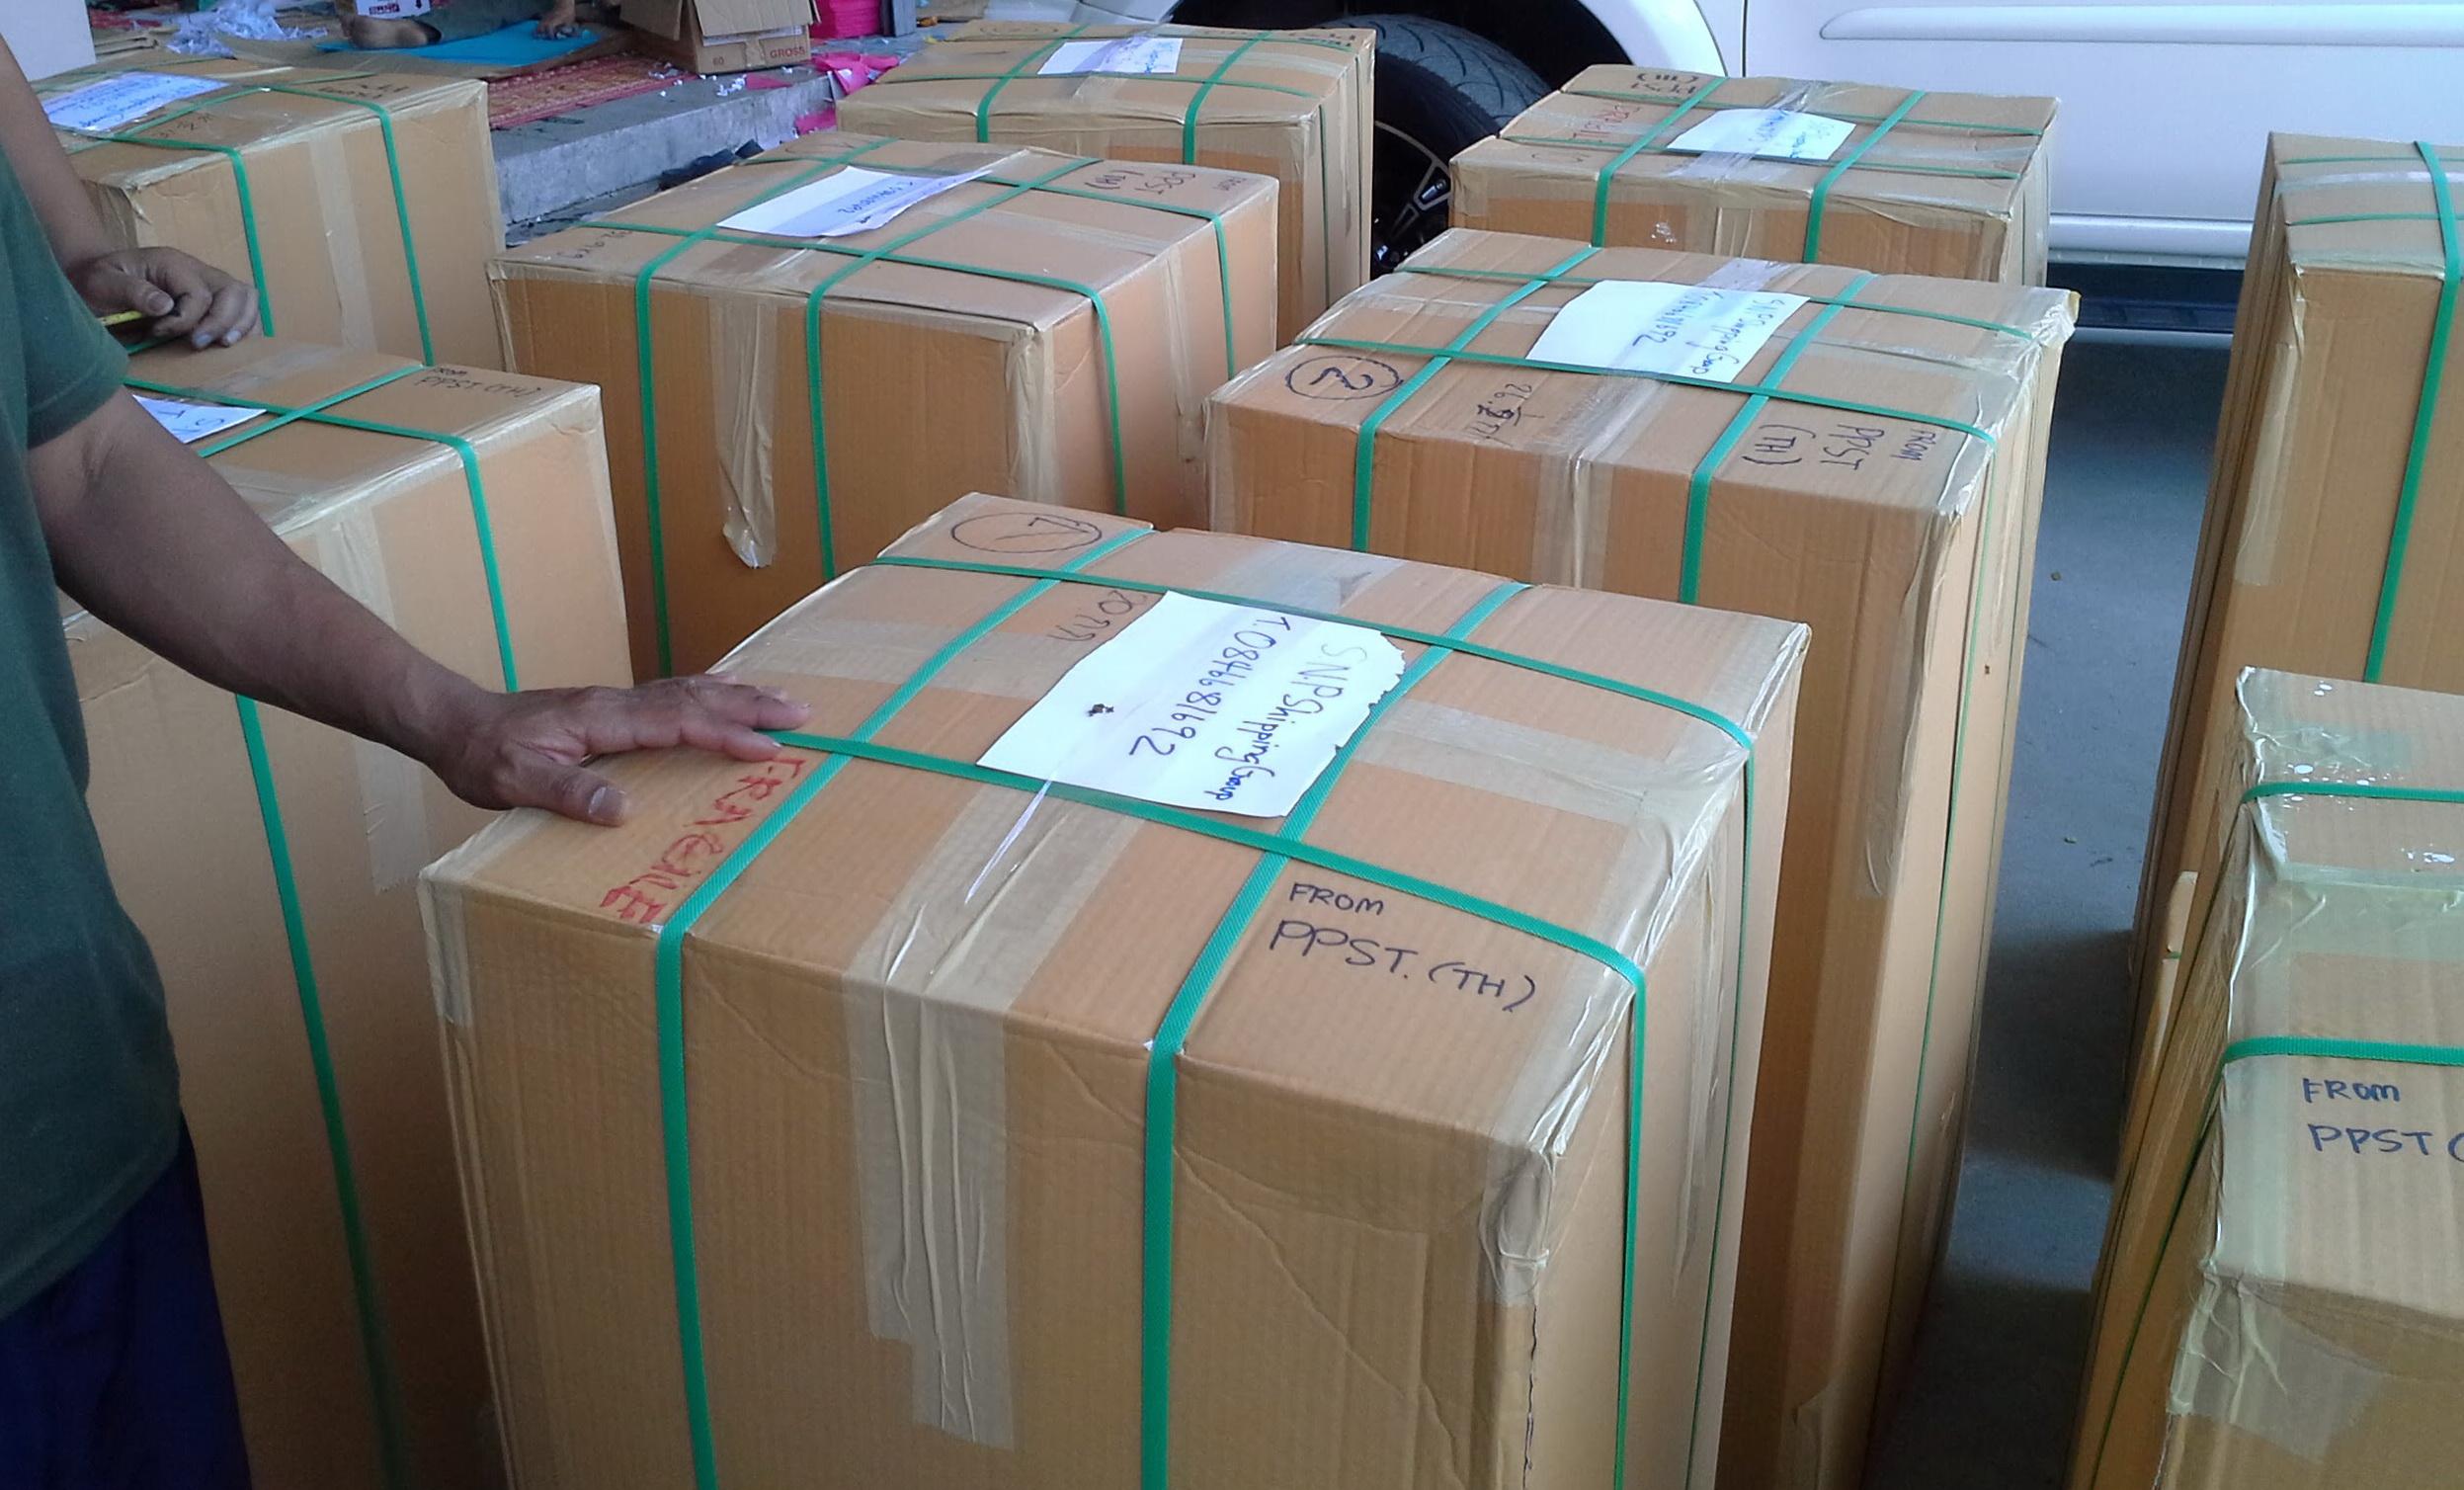 India shipment